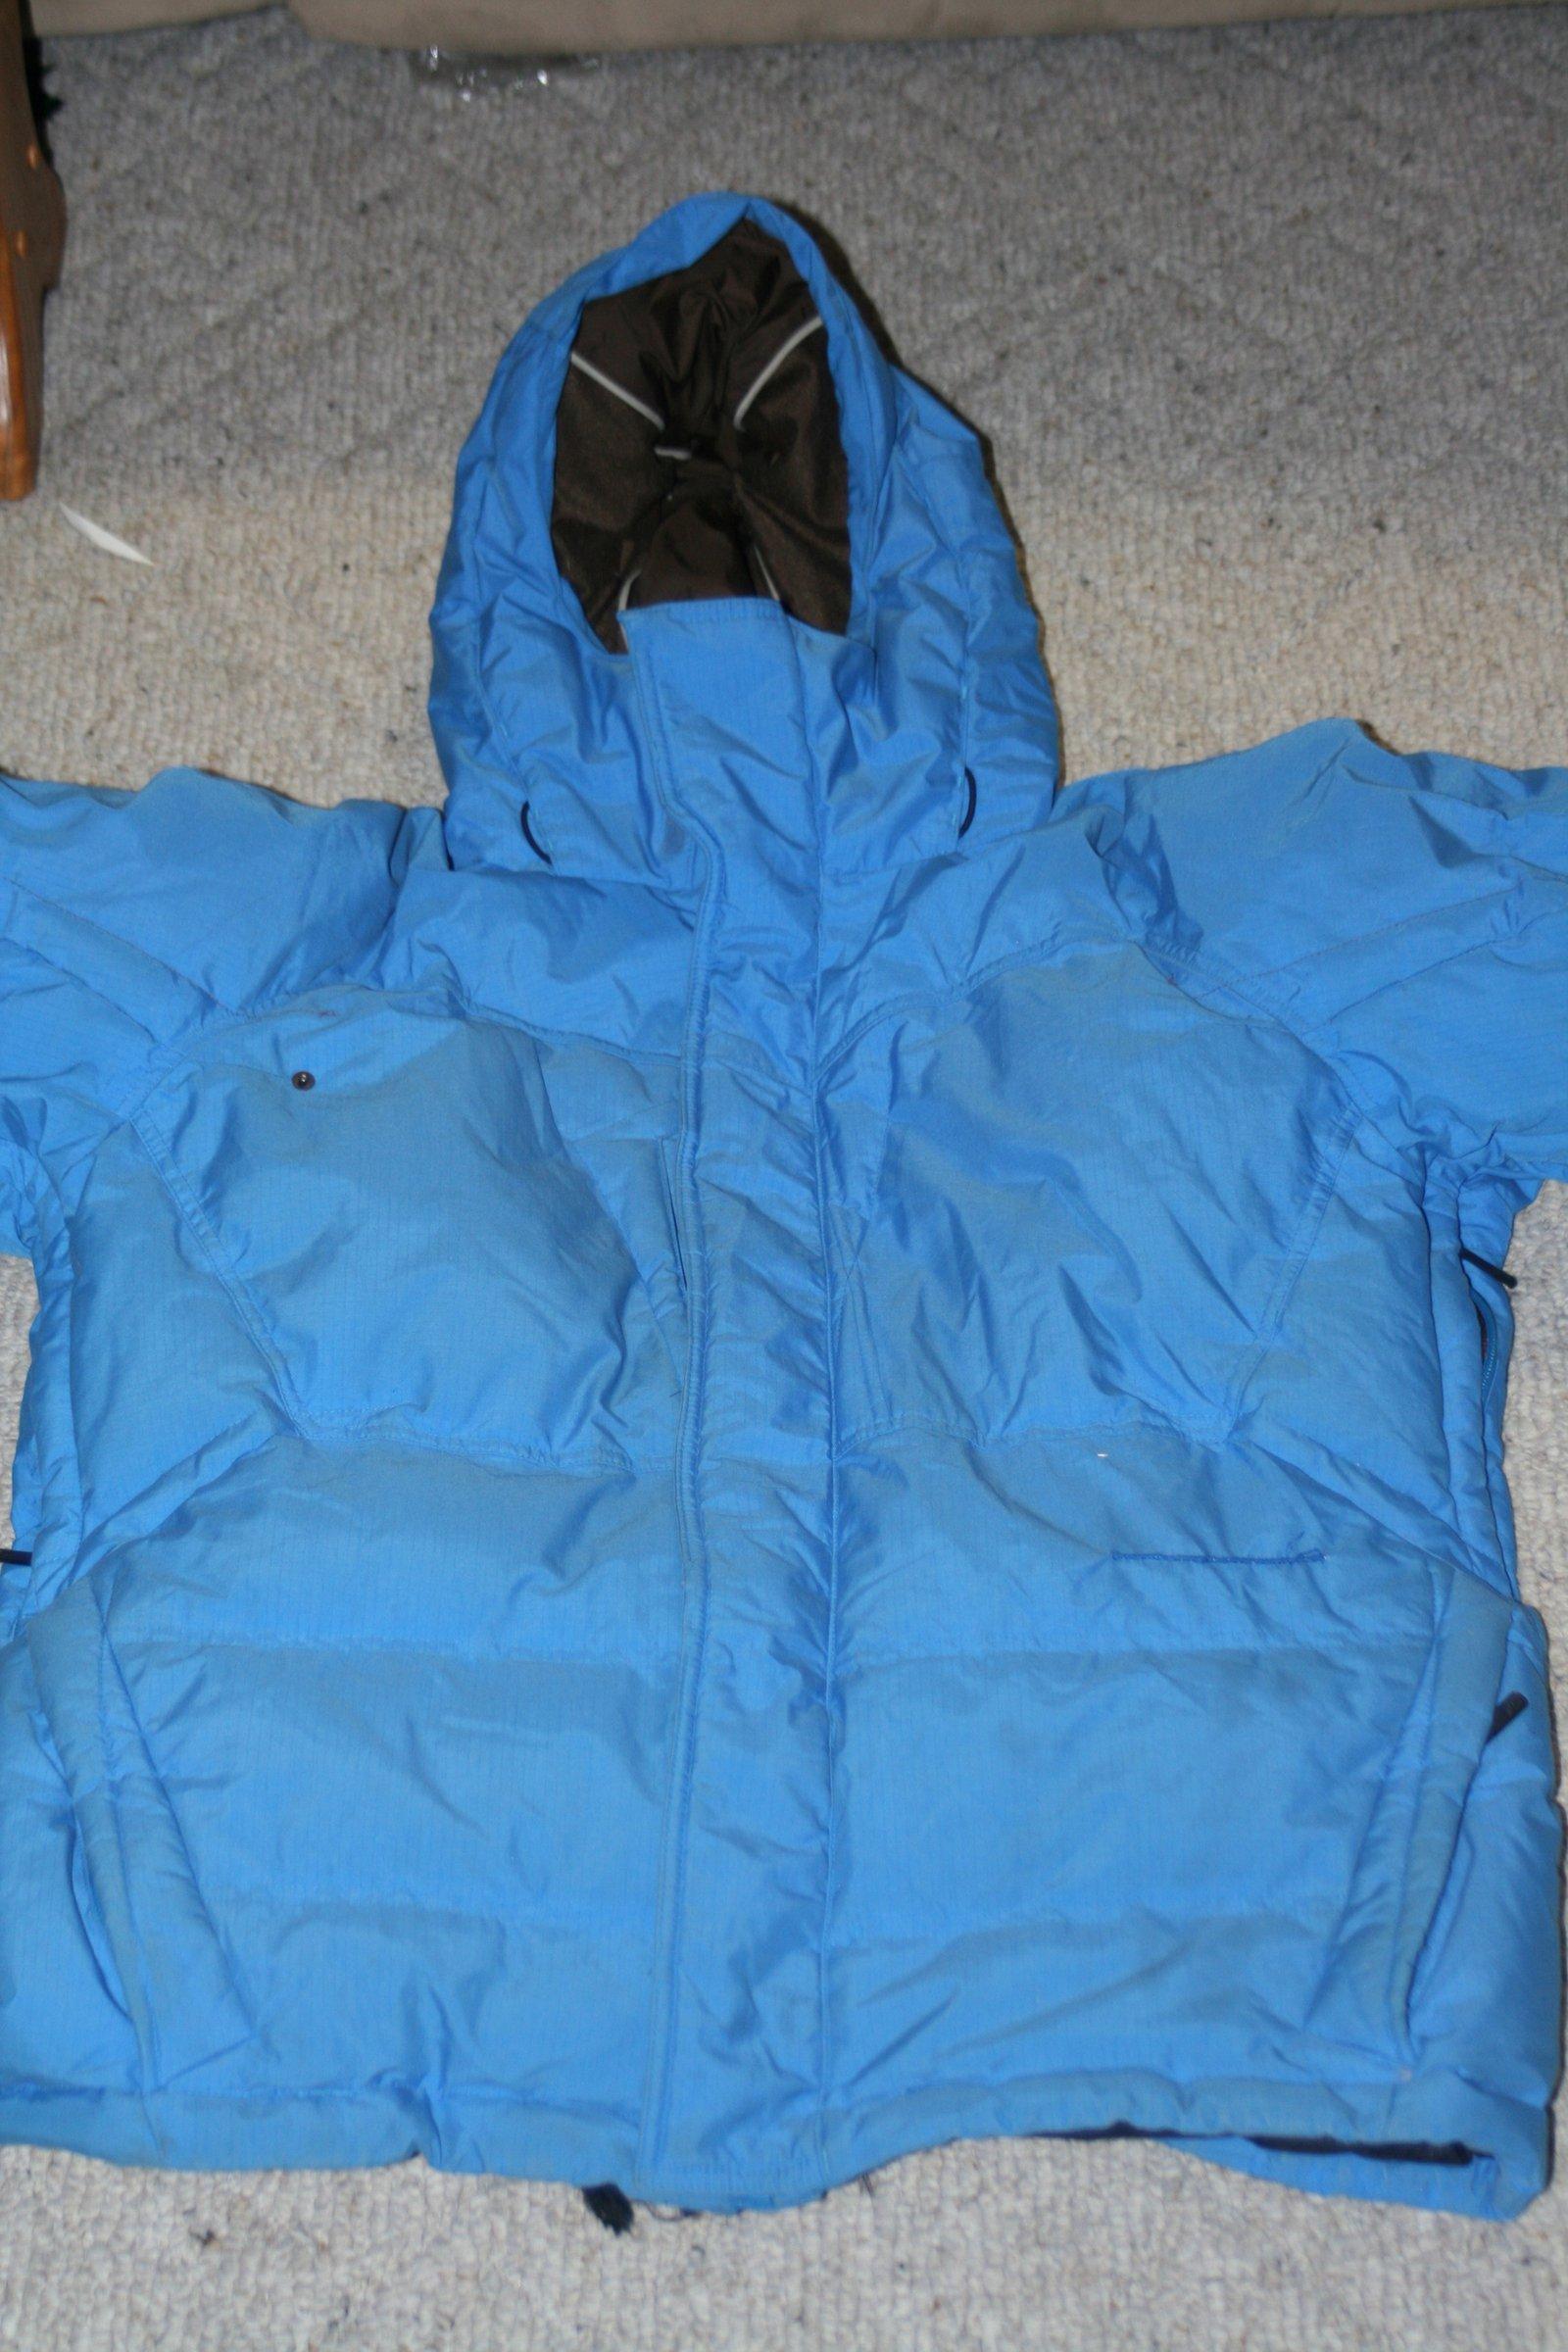 Blue bonfire jacket pic 1